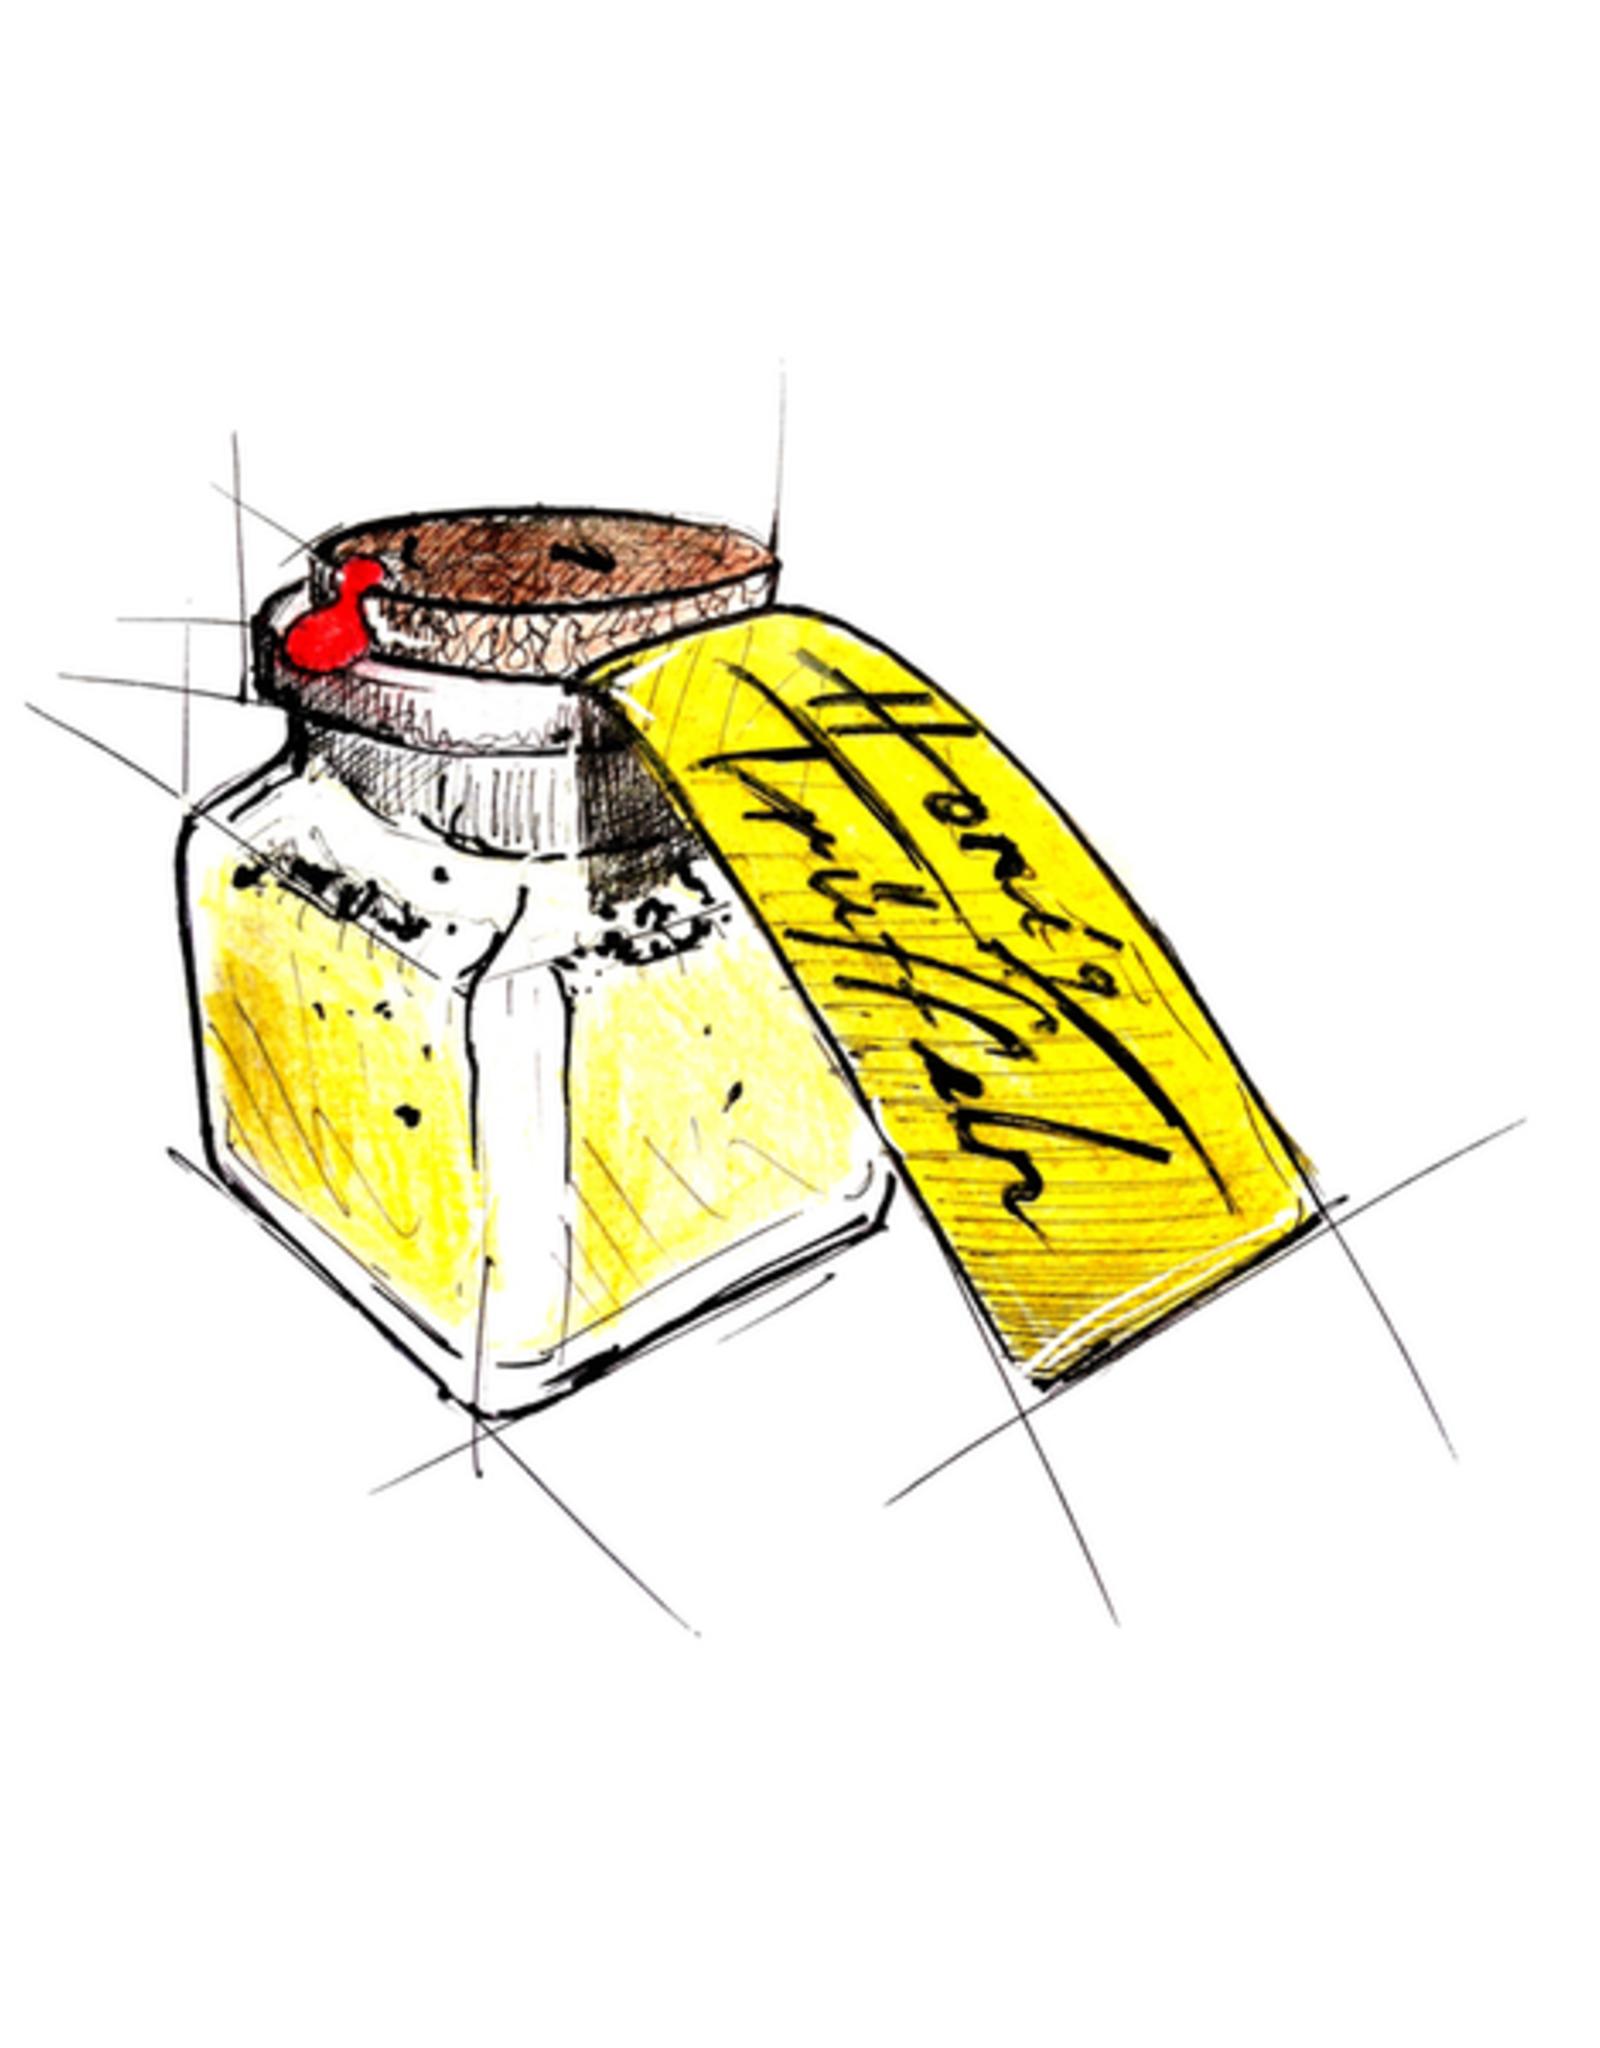 Schweizer Trüffelhonig, 125 ml - mit italienischem Trüffel